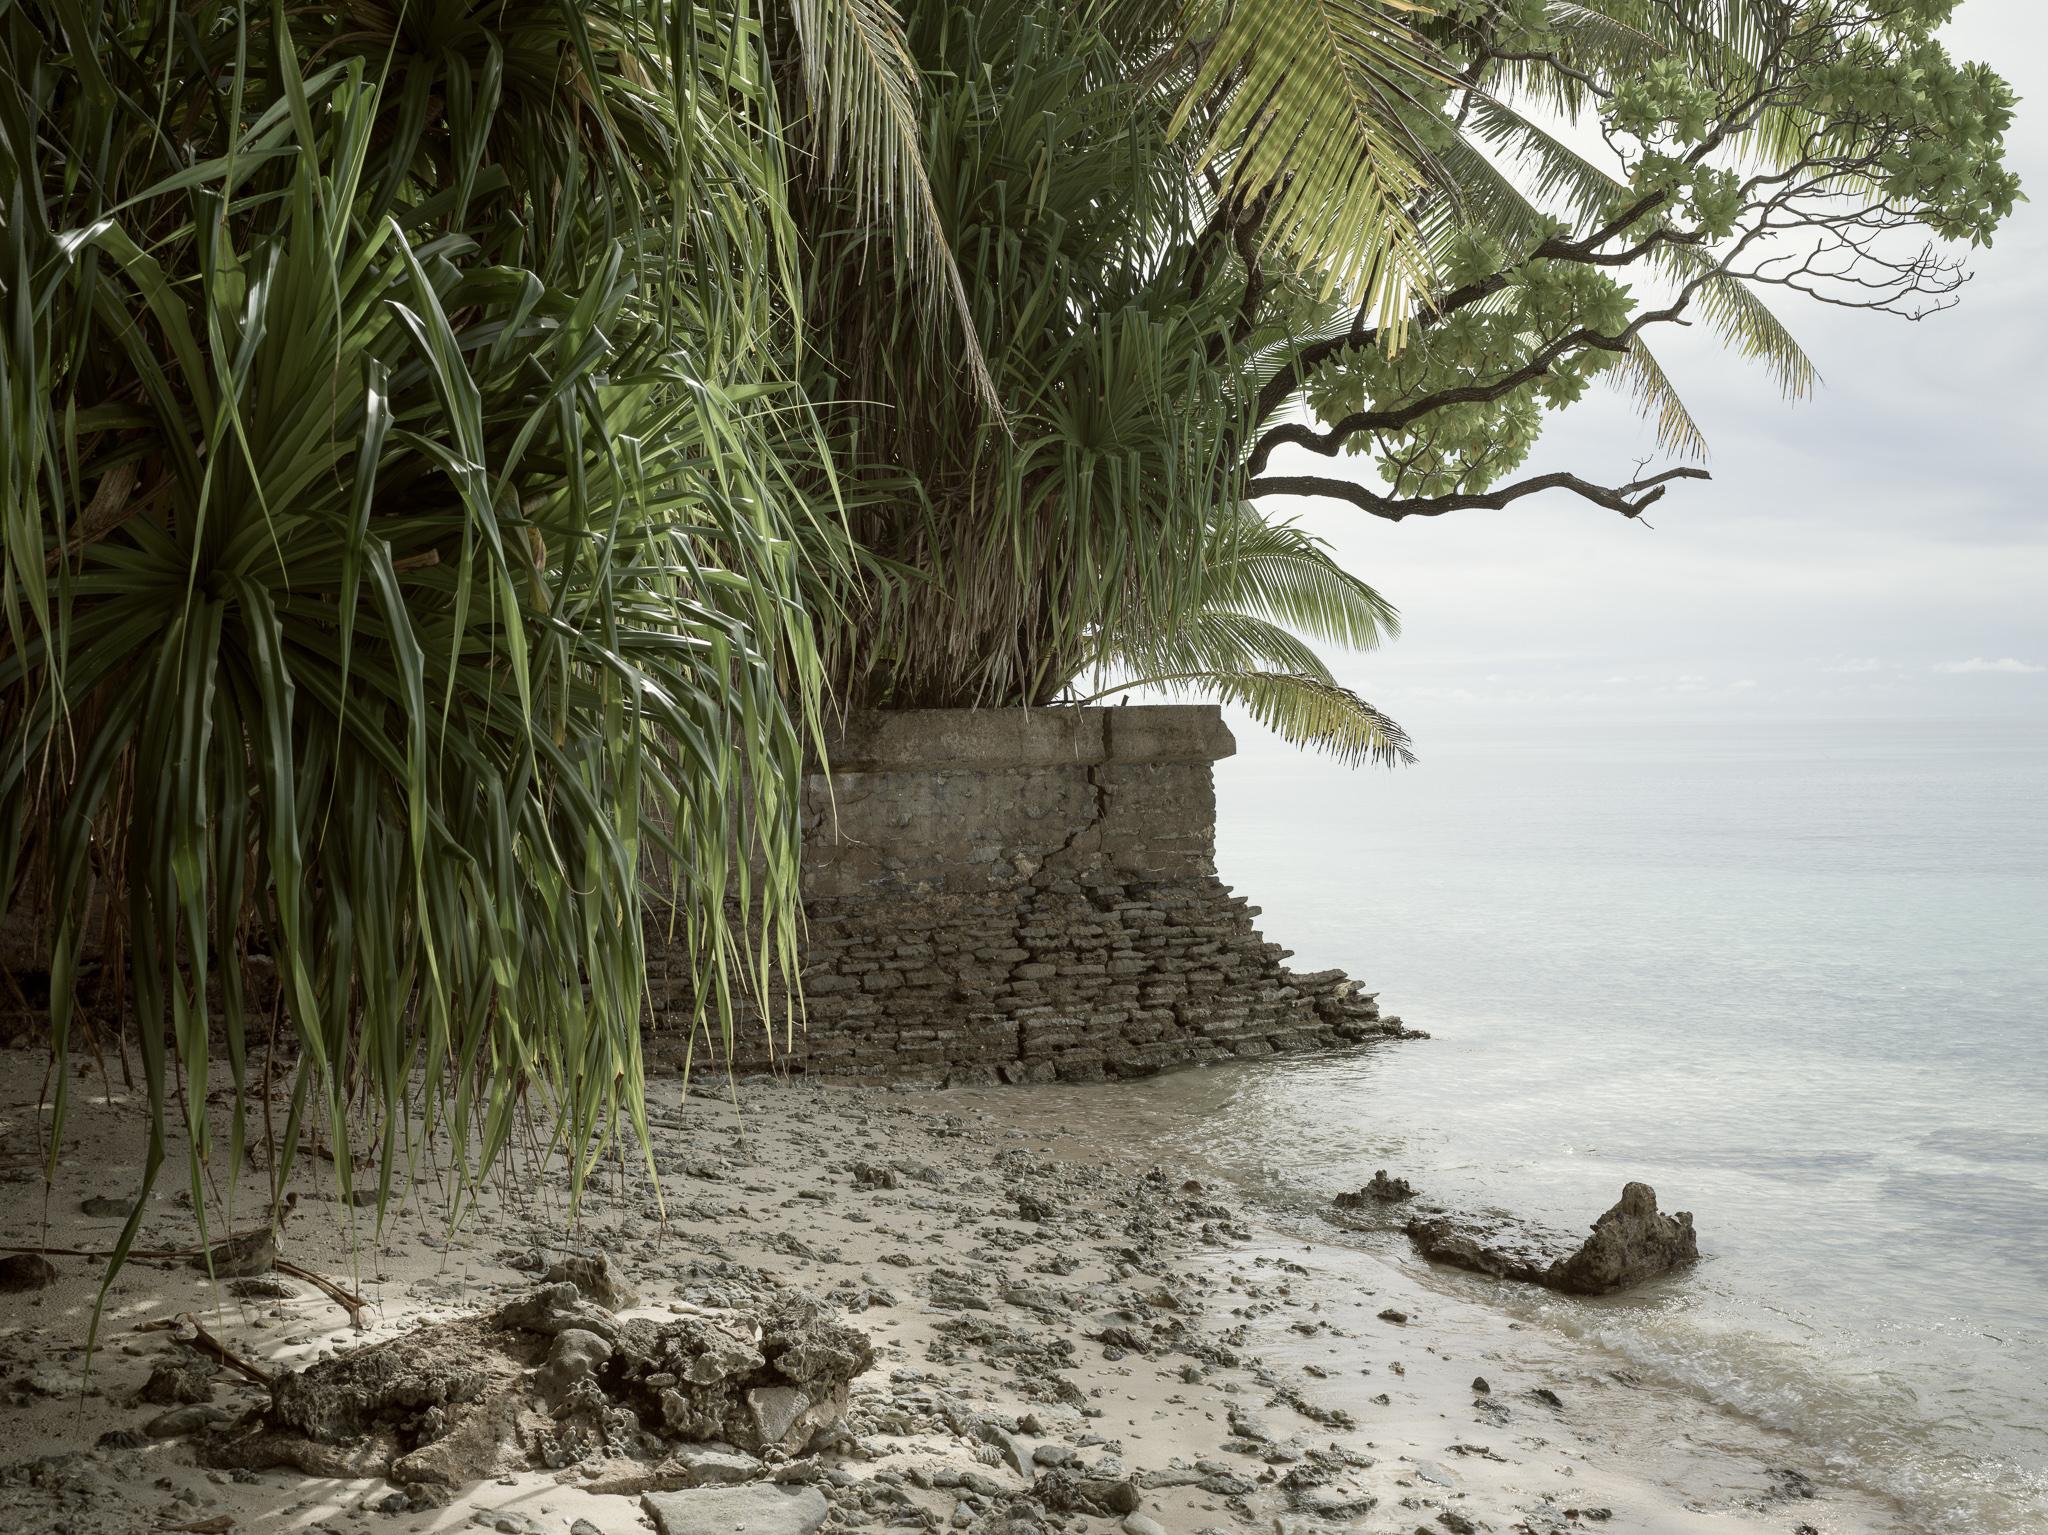 Japanese built seawall, Aineman Island, Jaluit Atoll, Marshall Islands_Matthew Arnold